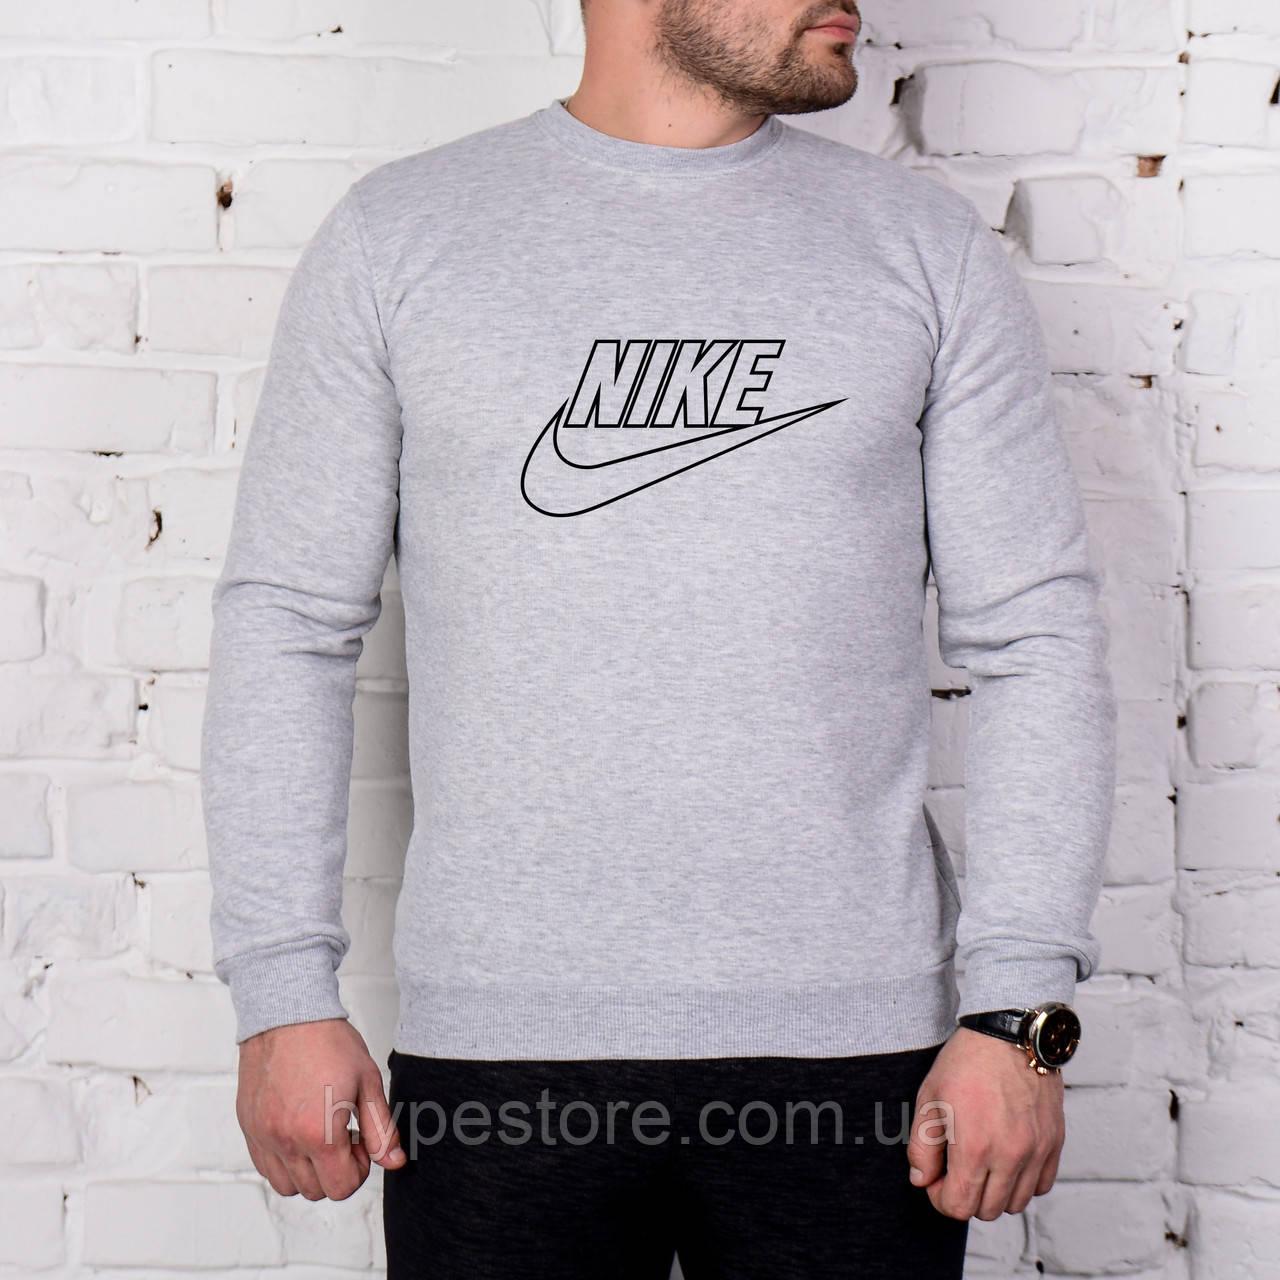 Мужской спортивный серый свитшот, кофта, лонгслив, реглан Nike Air, найк аир, Реплика